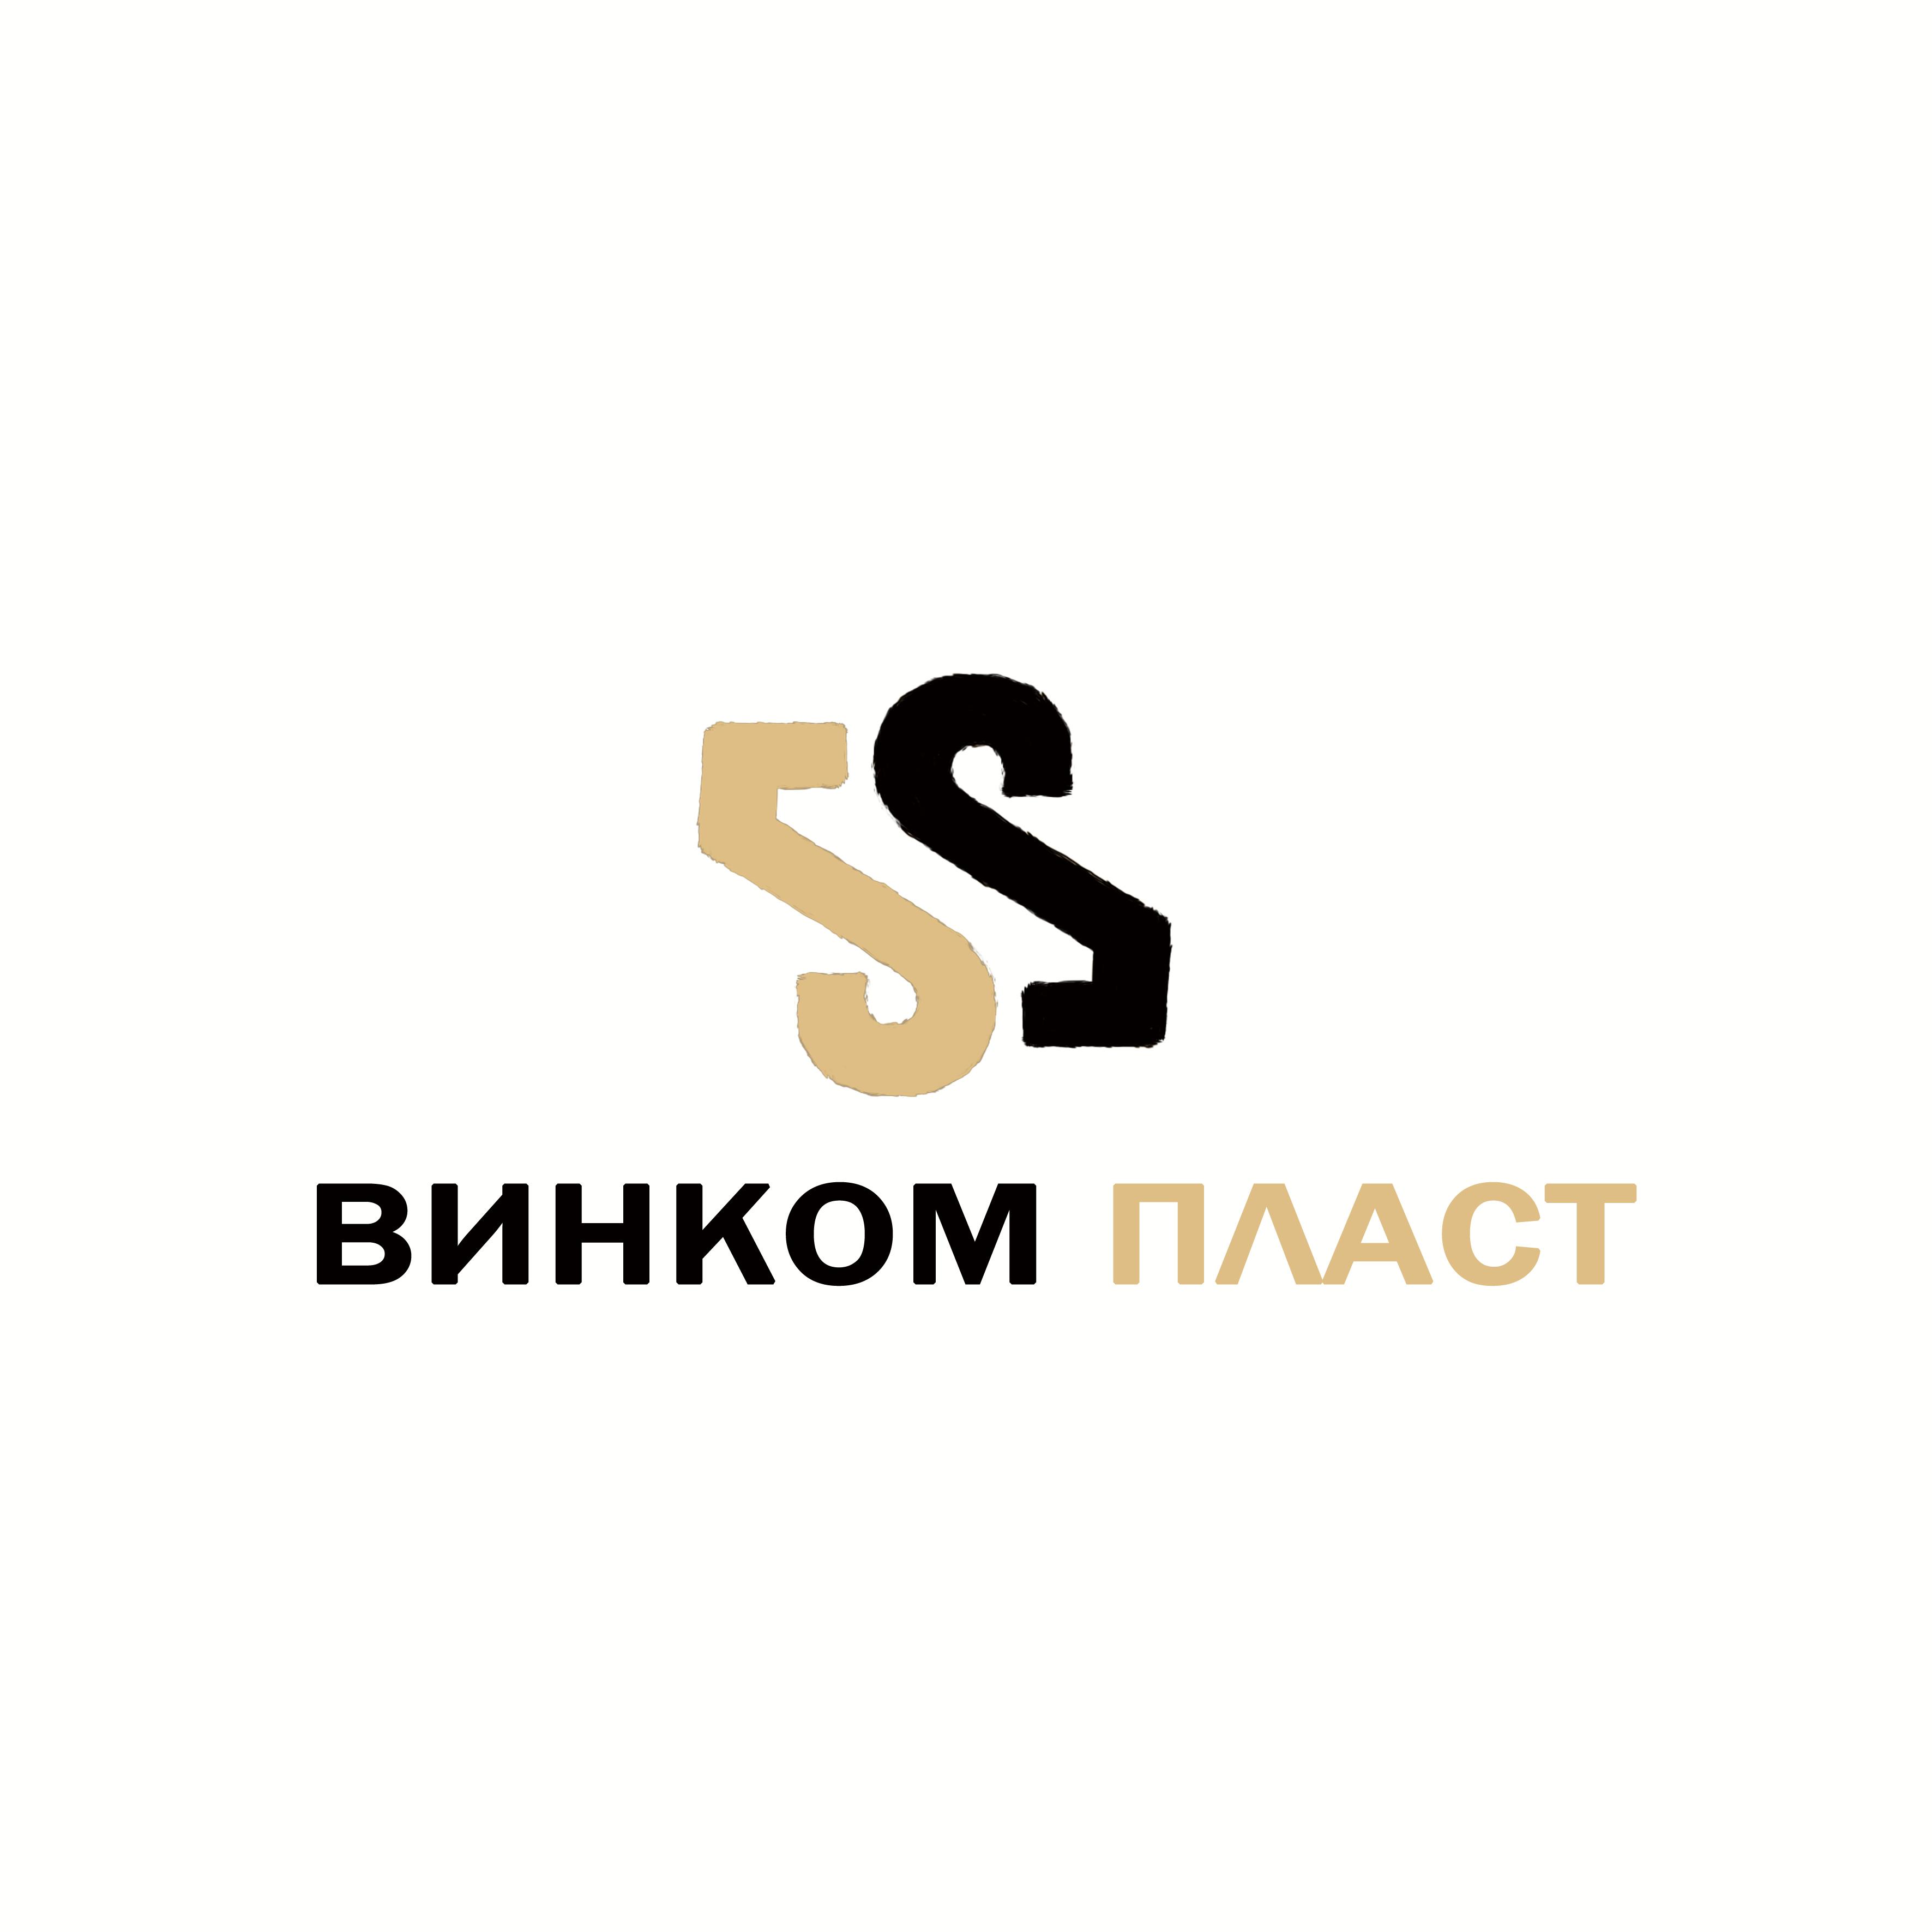 Логотип, фавикон и визитка для компании Винком Пласт  фото f_2225c35e33d34039.jpg